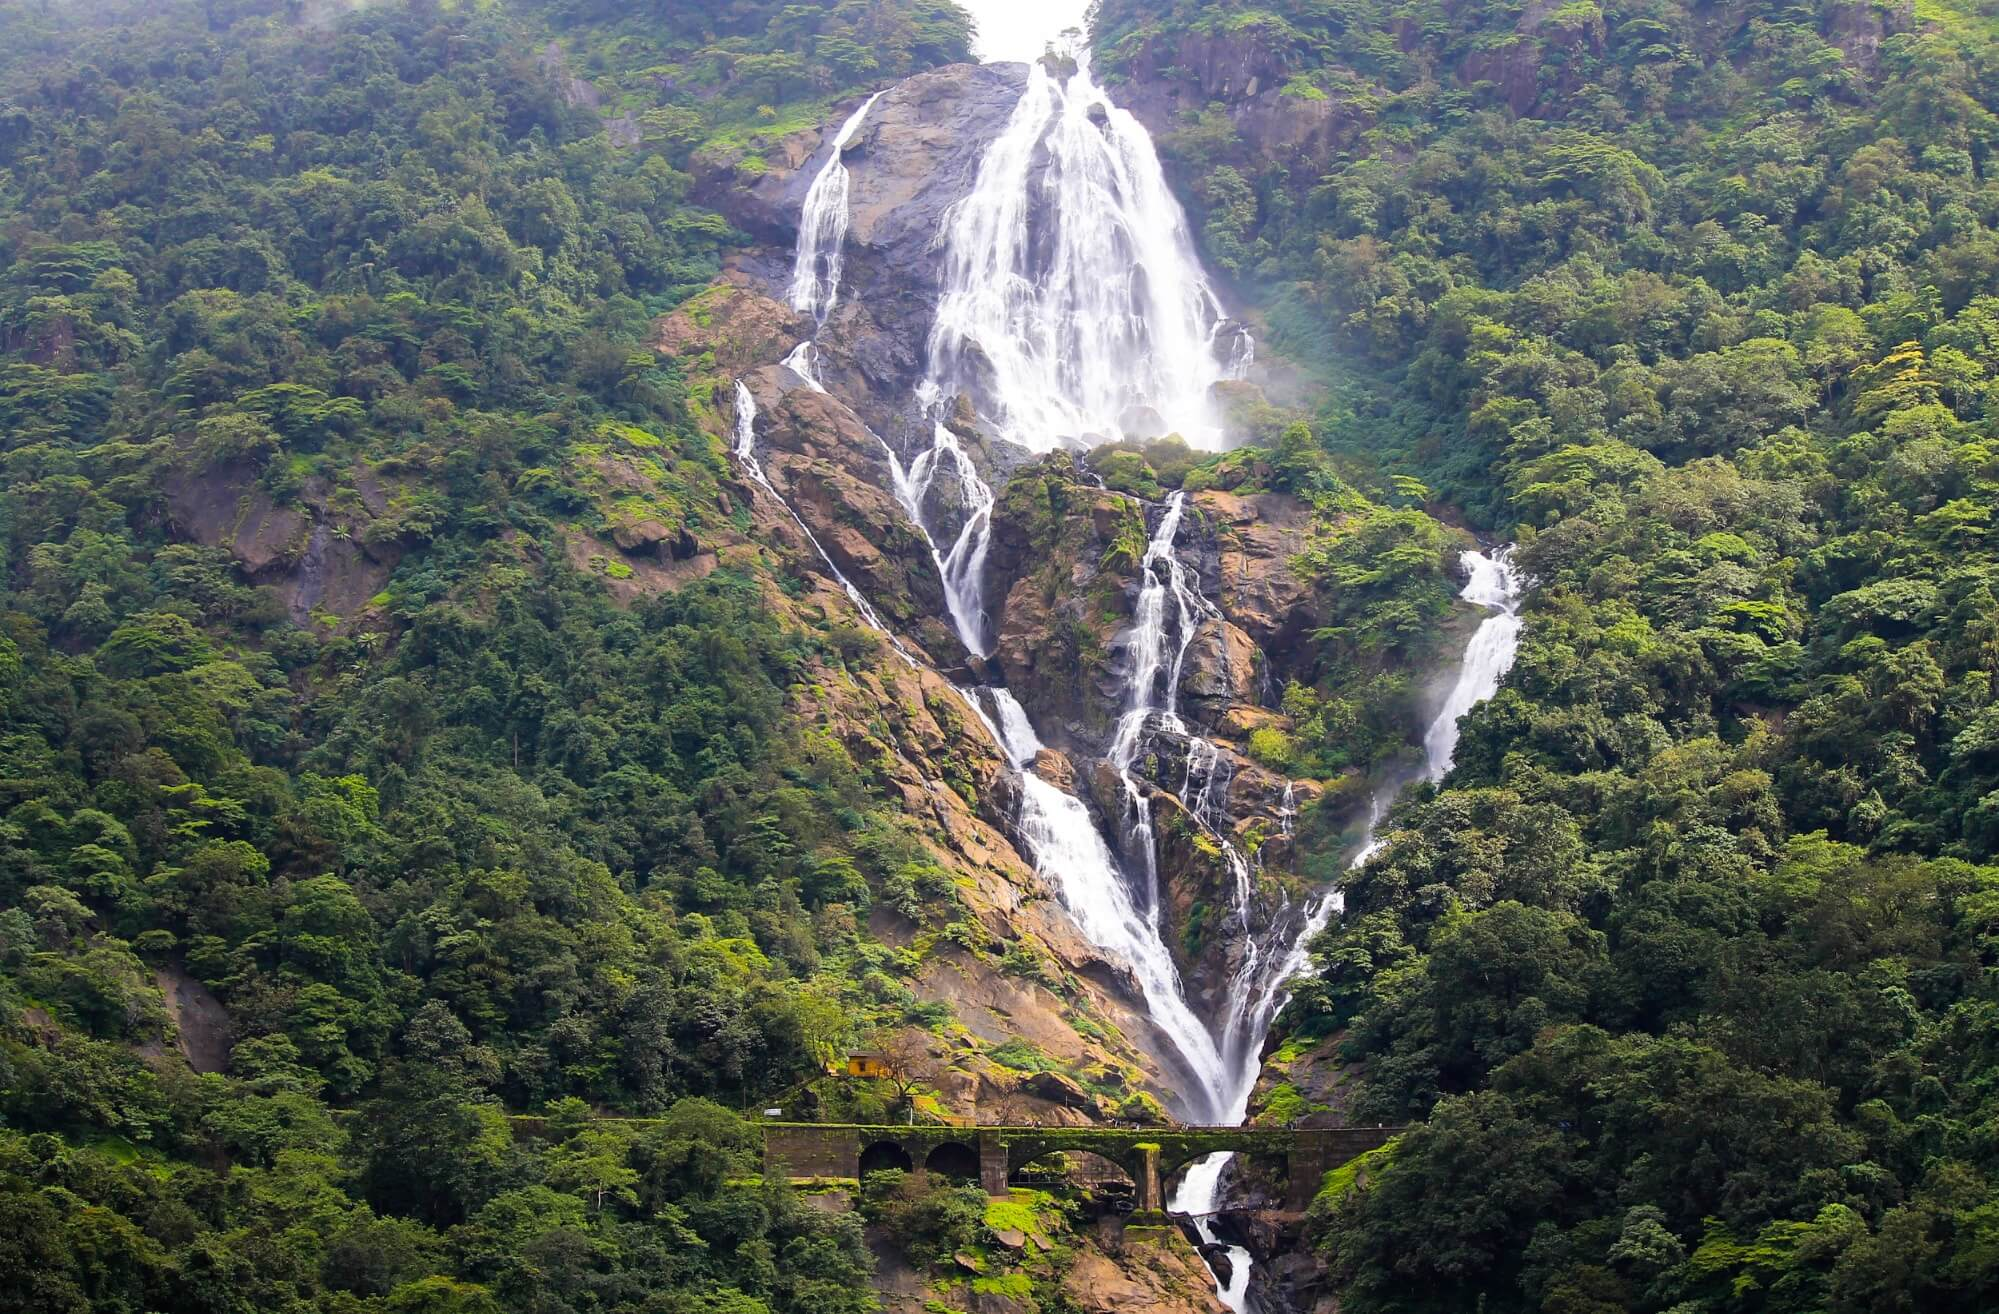 Duddhsagar waterfalls in Goa